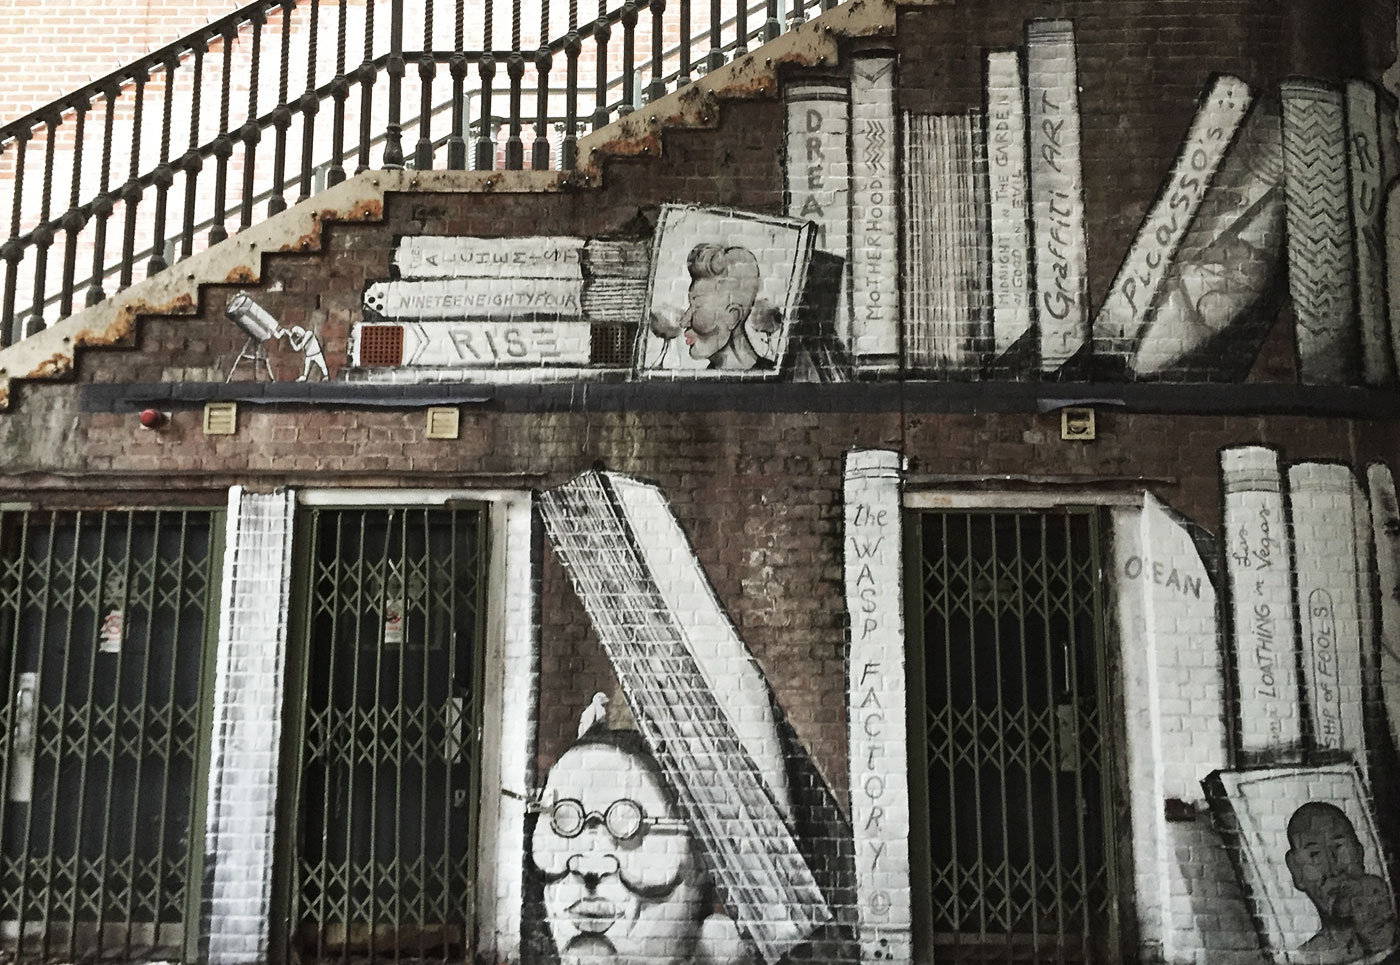 RUN book mural art, Surrey Street, Croydon